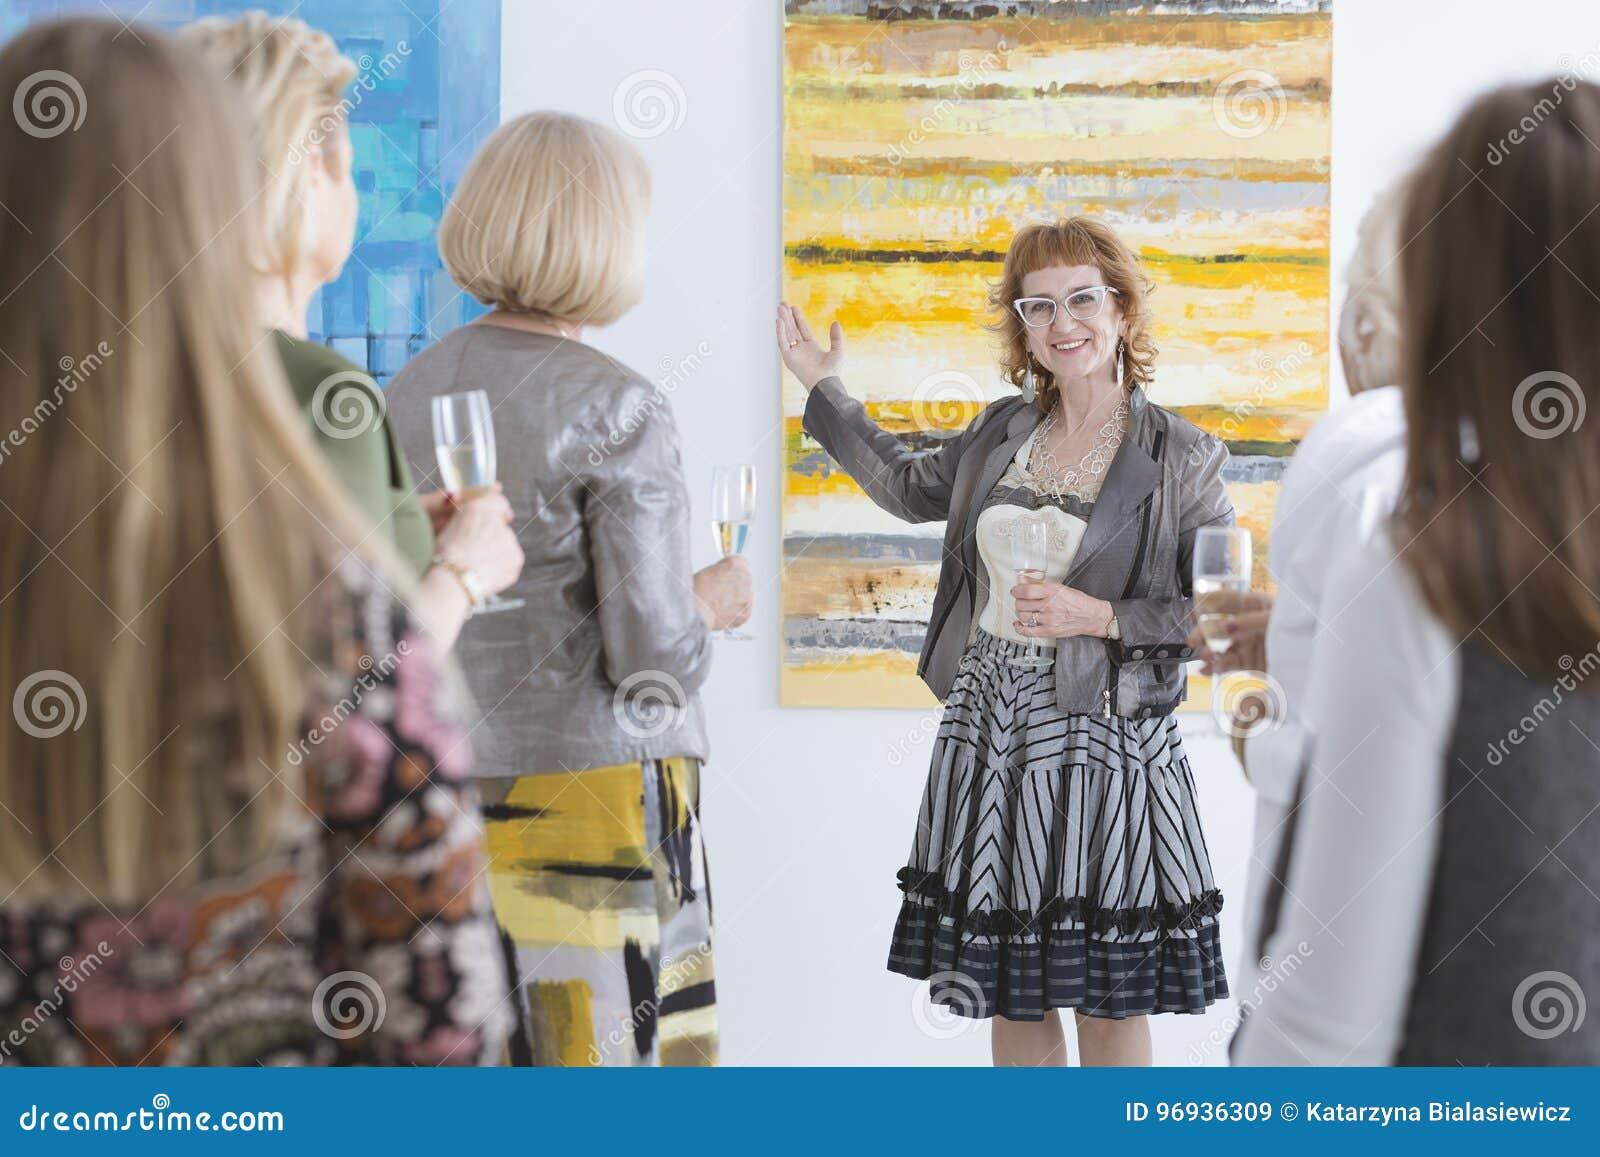 Artiste présent sa peinture